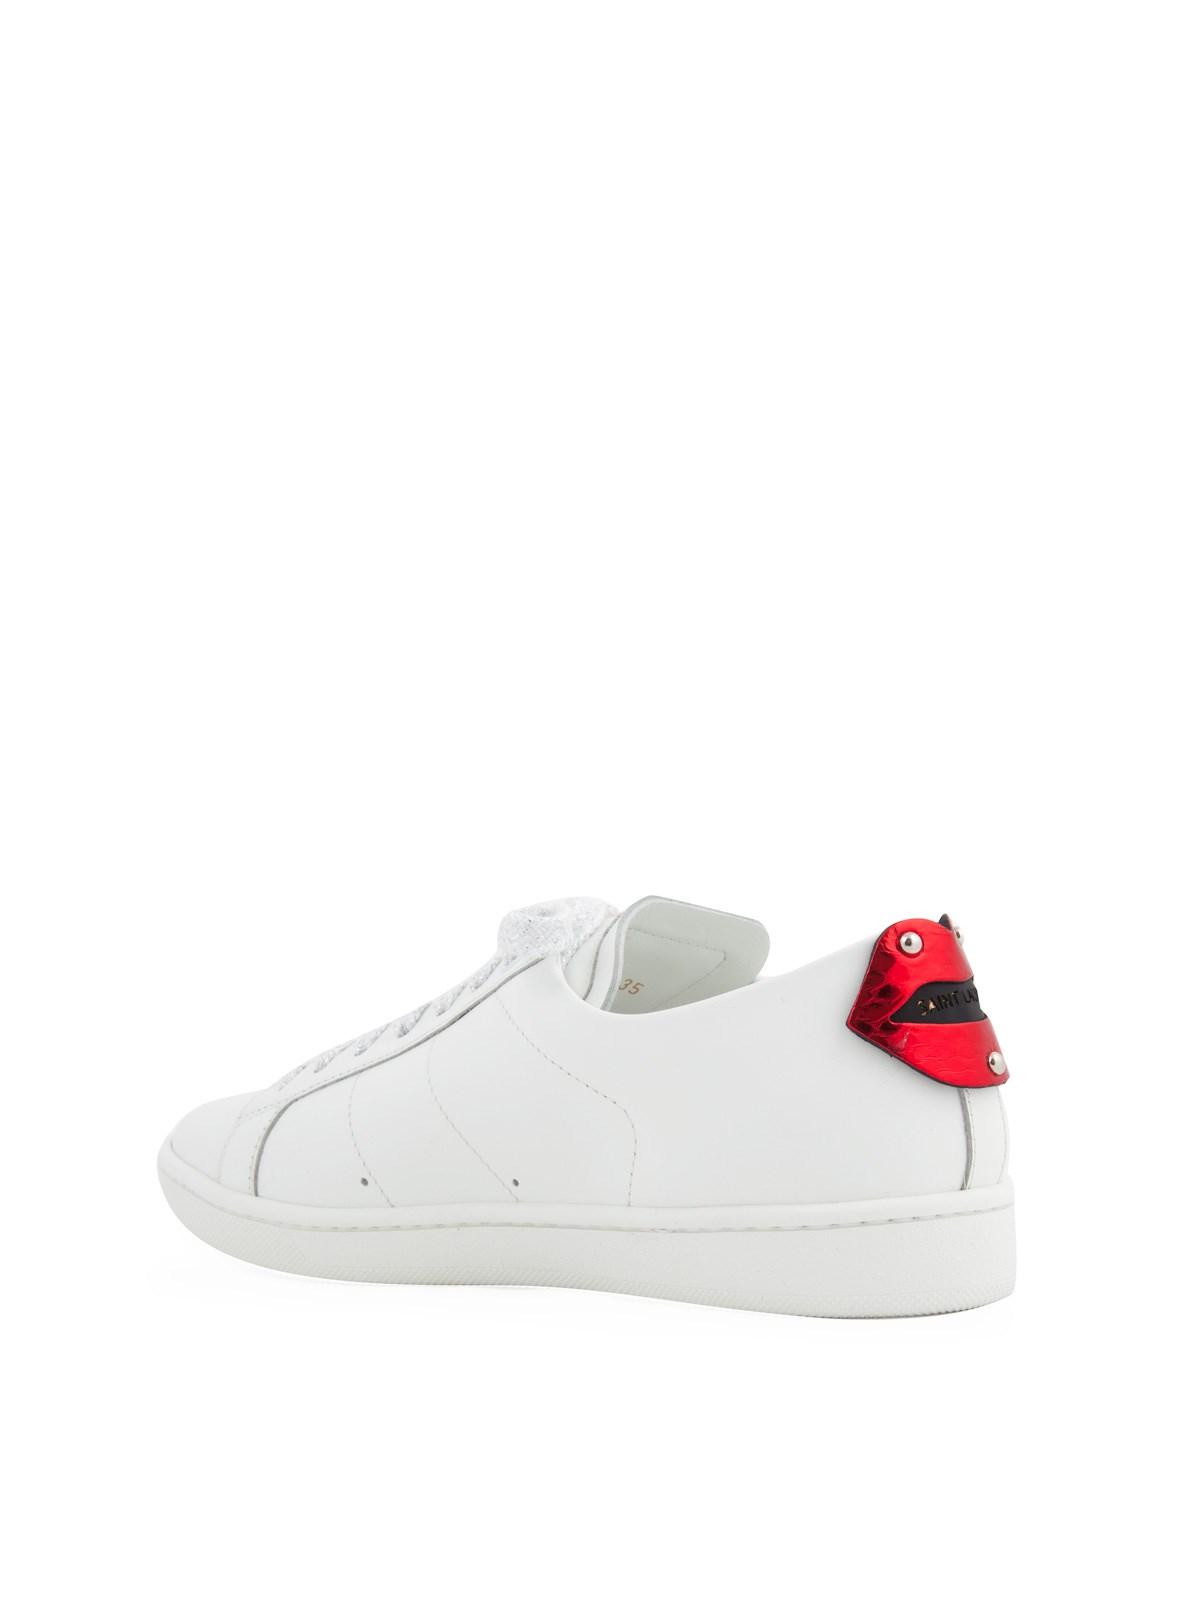 ysl sneakers lips